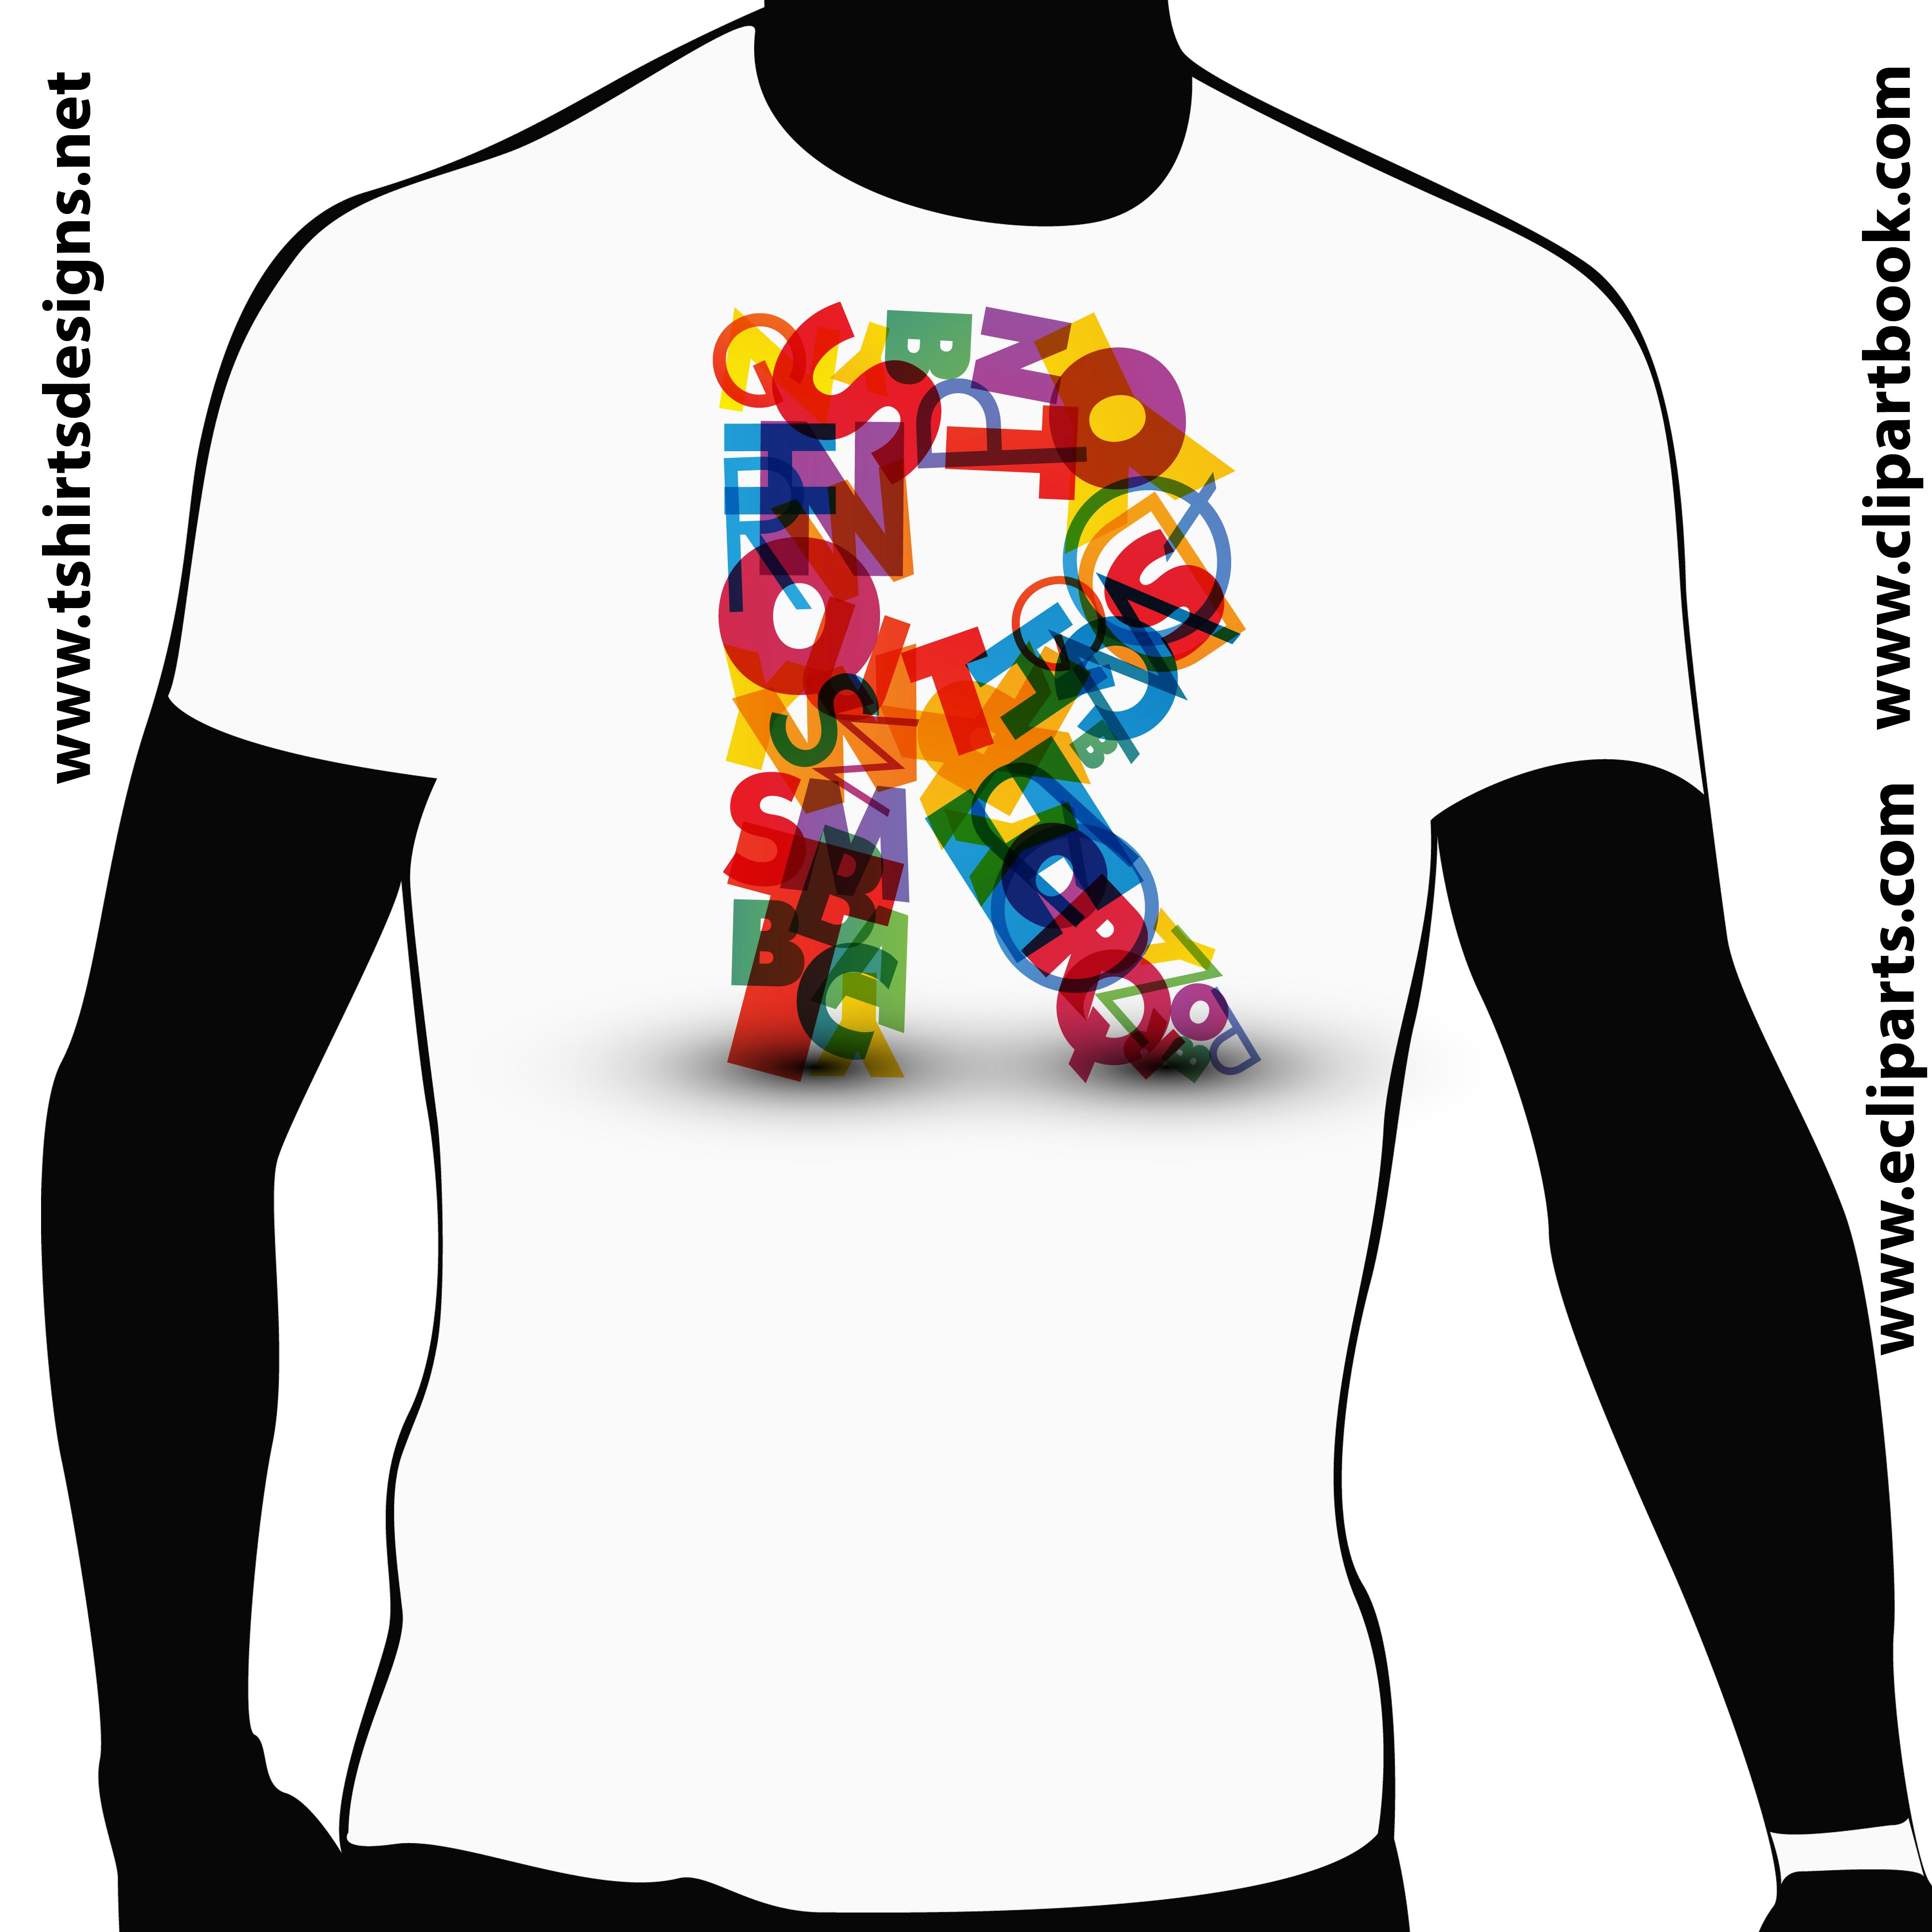 Polo T Shirt Design Online